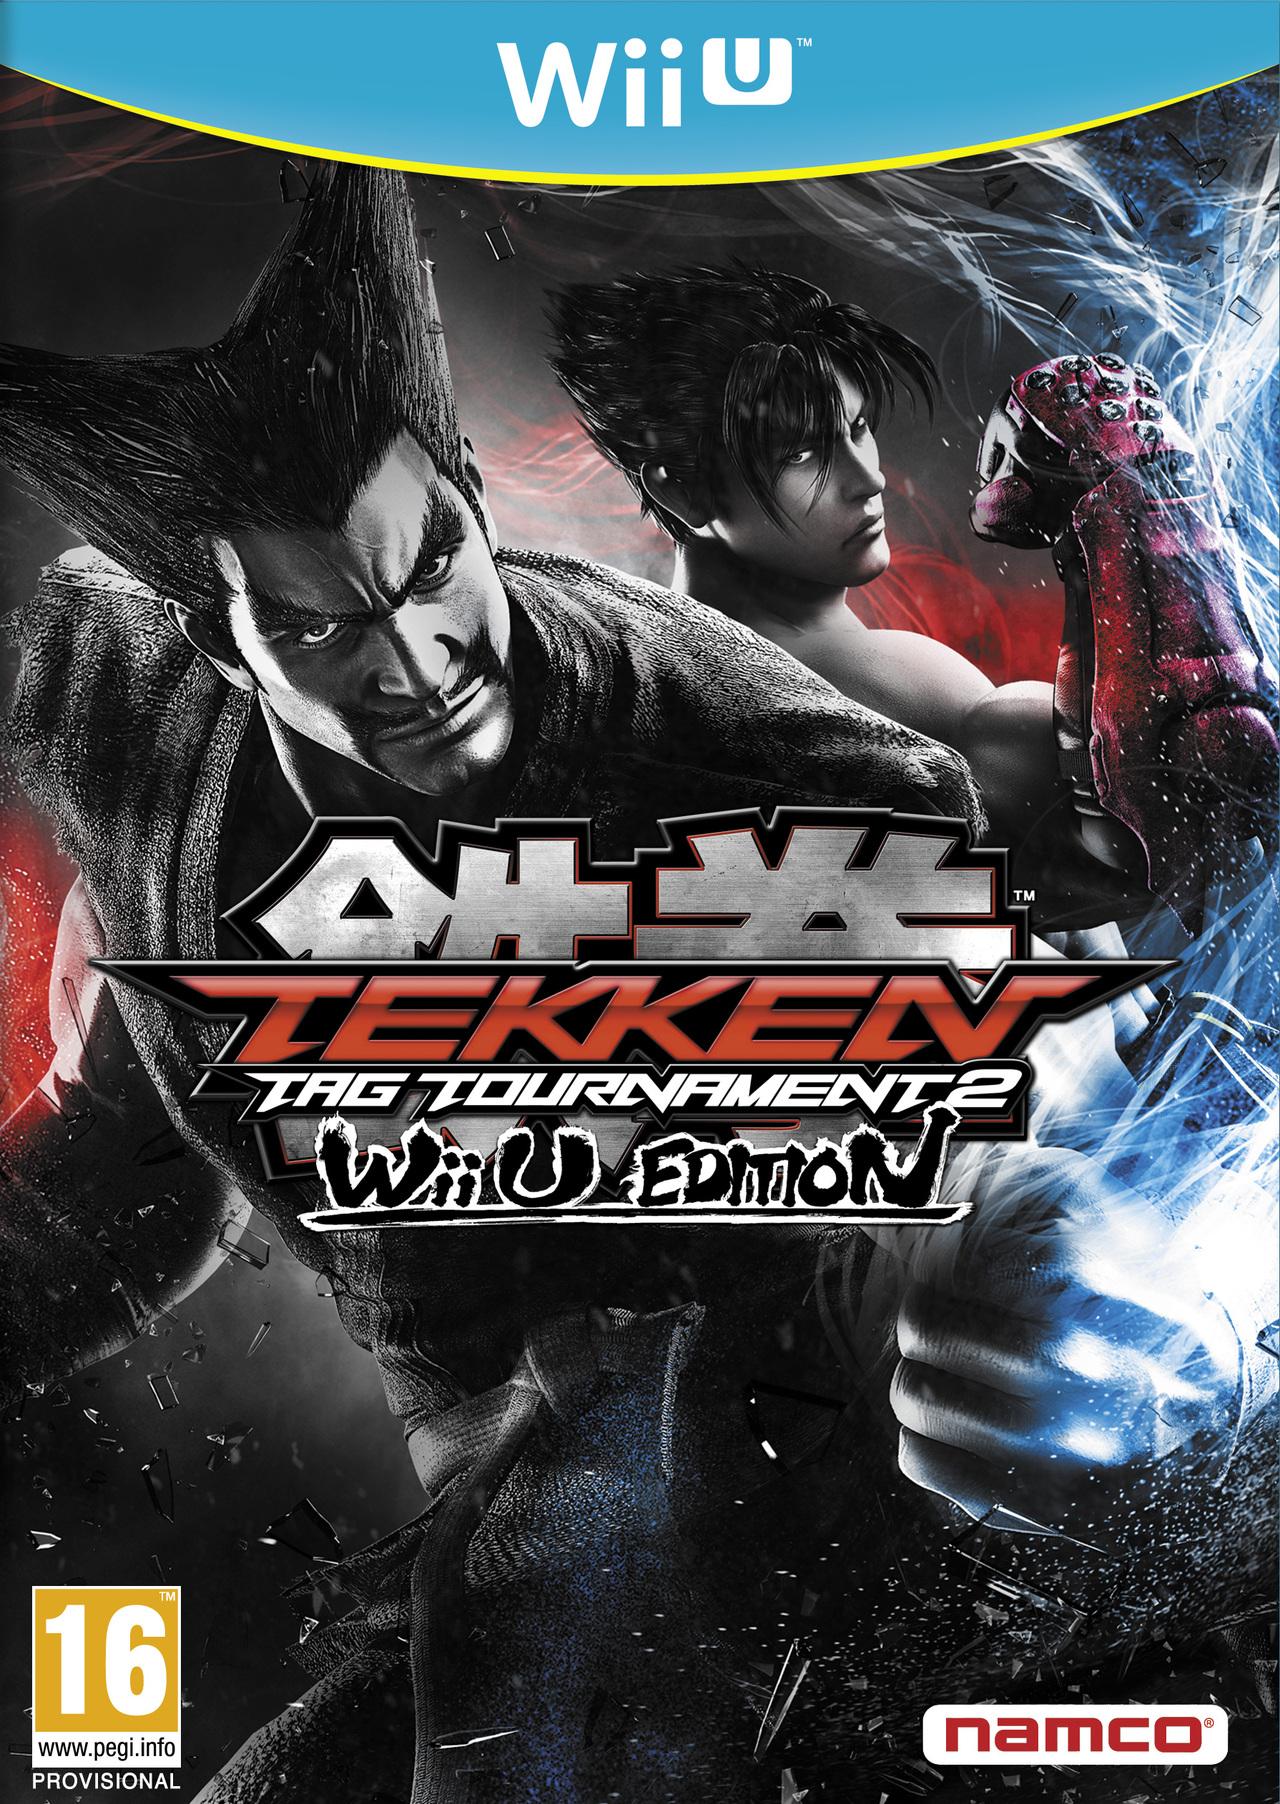 TekkenTagTournament2 Wii U Jaquette 001